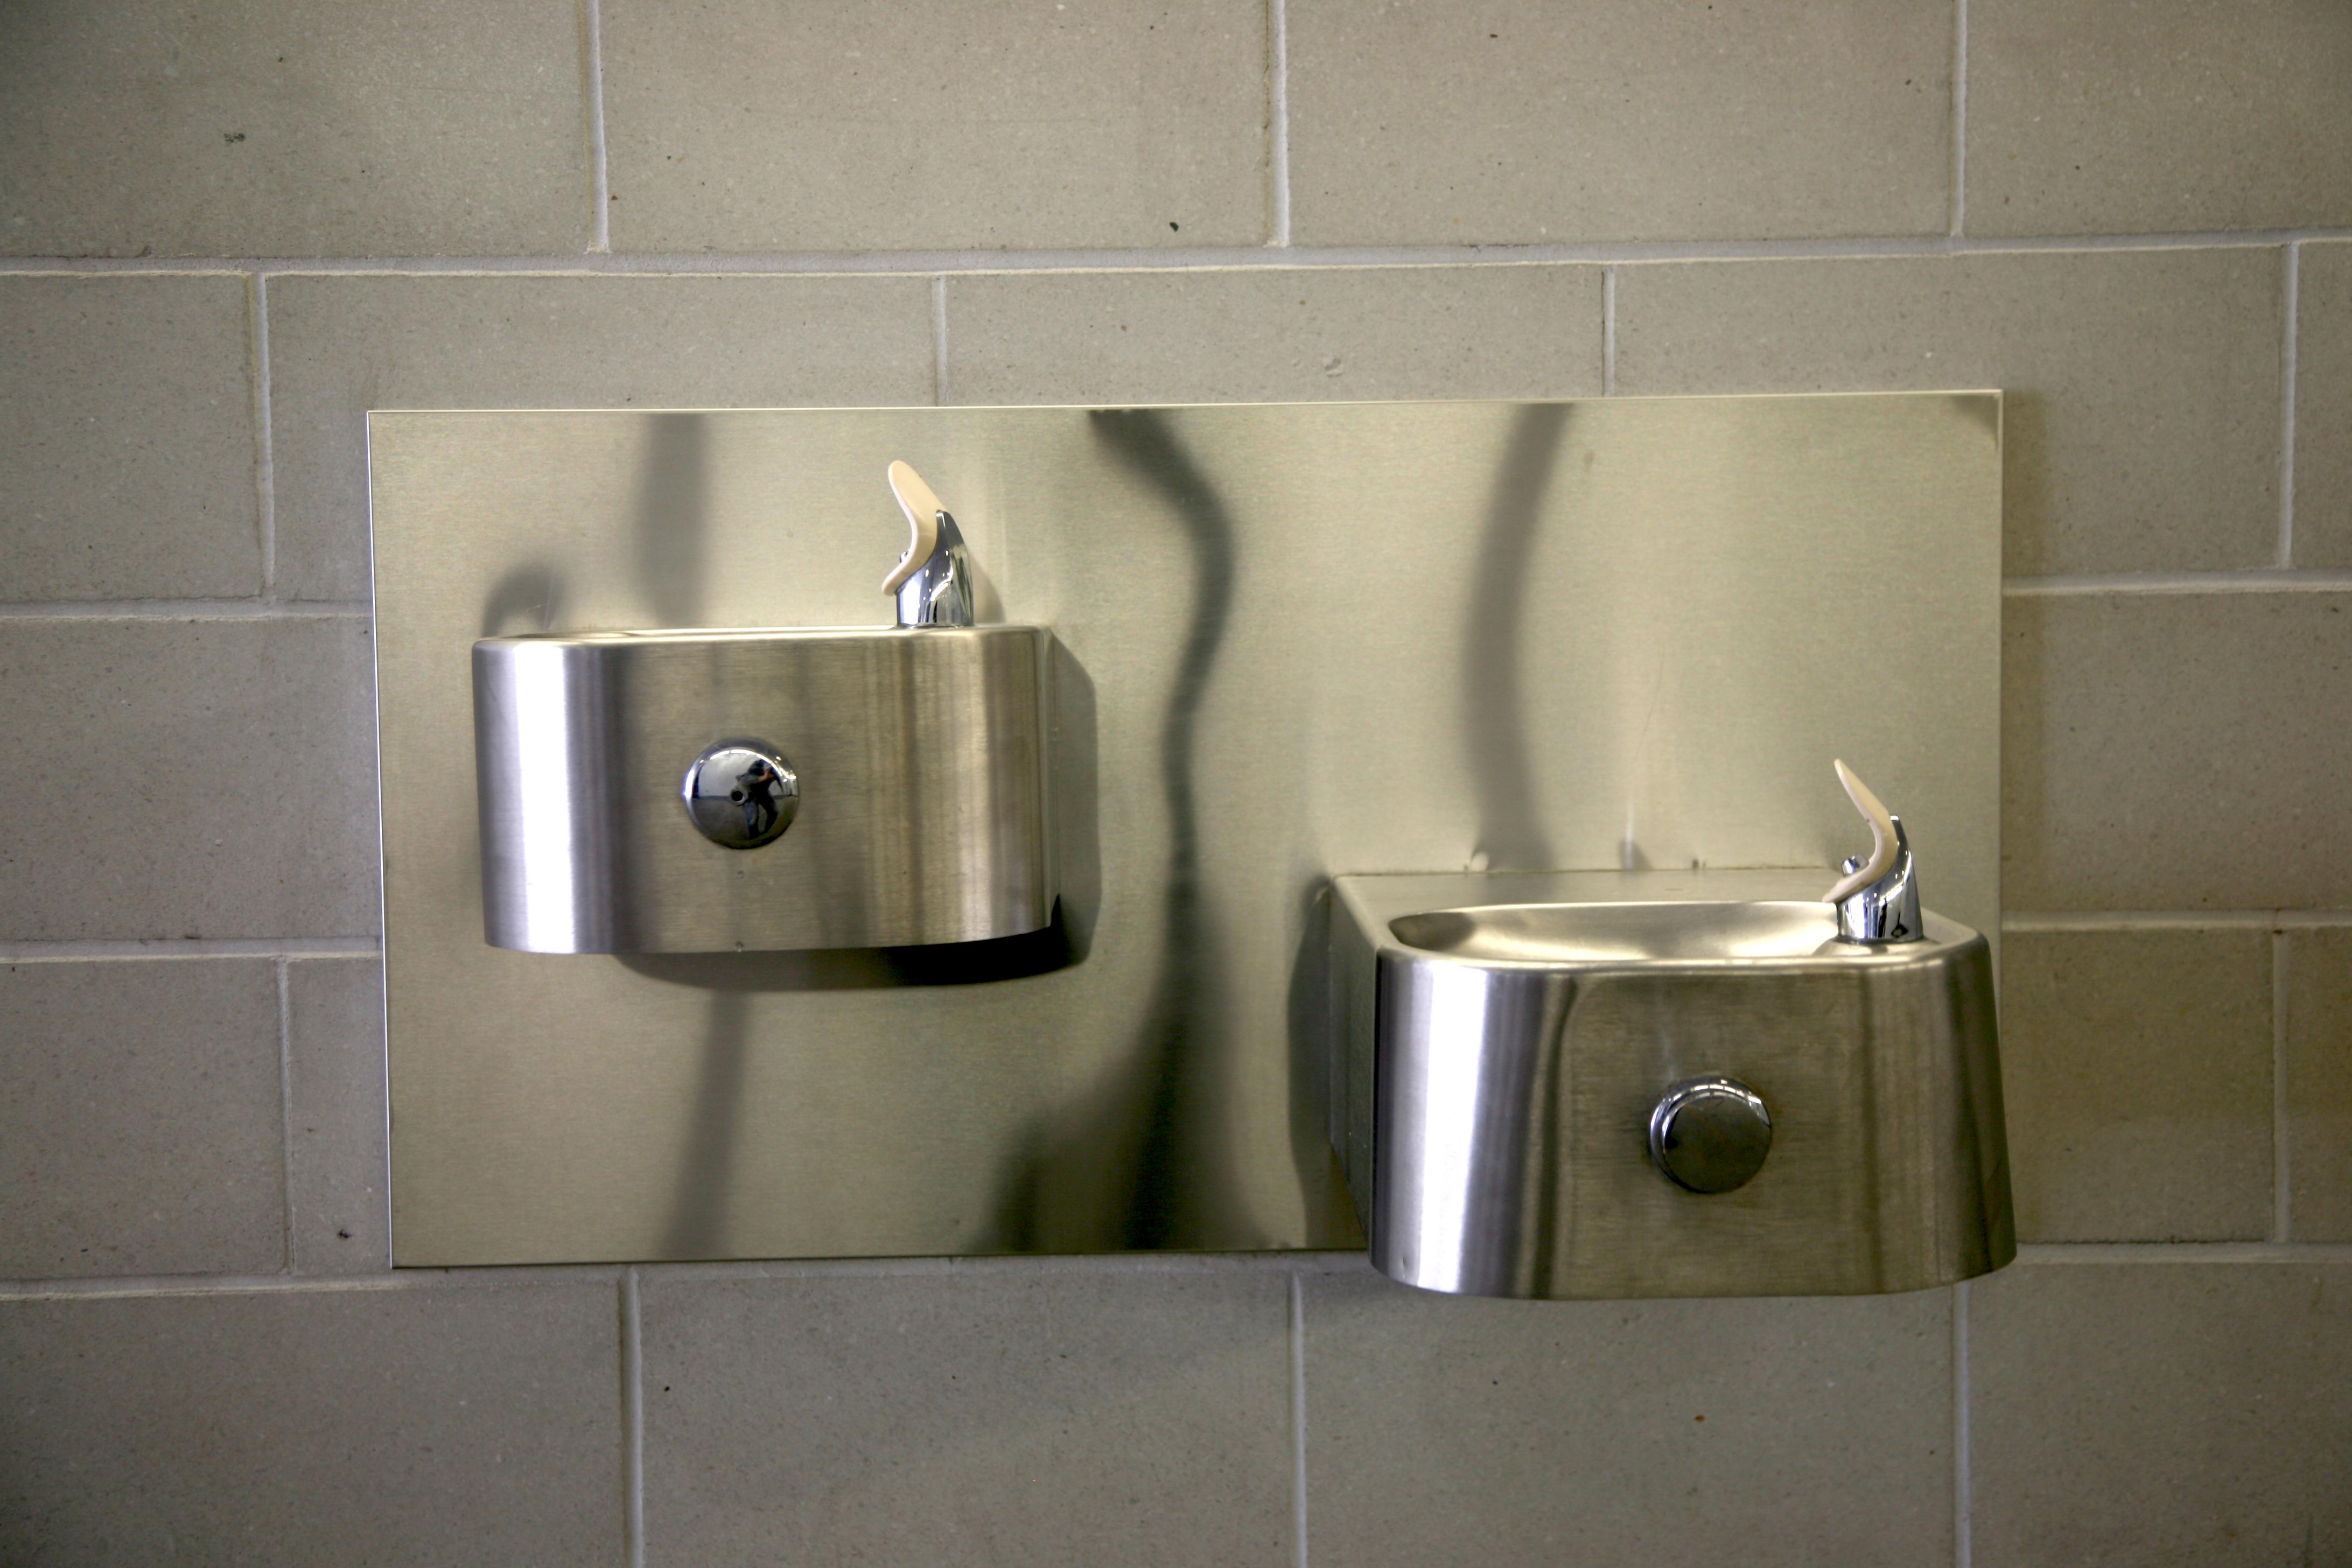 Urinoir In Badkamer : Gratis afbeeldingen : wolk canon park chicago toilet tegel